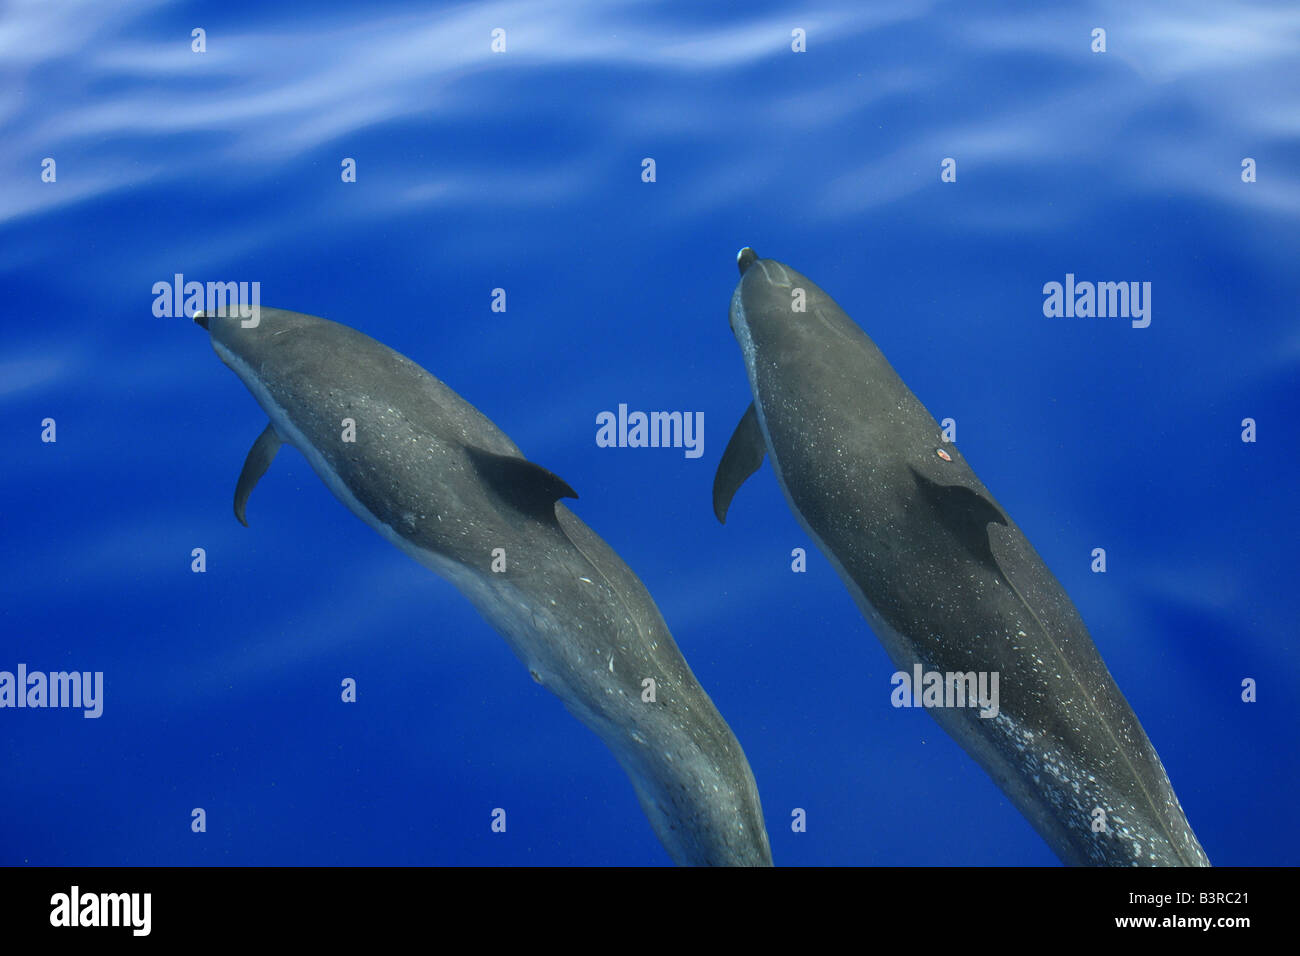 Pantropical spotted dolphin Stenella attenuata bow riding near the surface Kailua Kona Hawaii - Stock Image